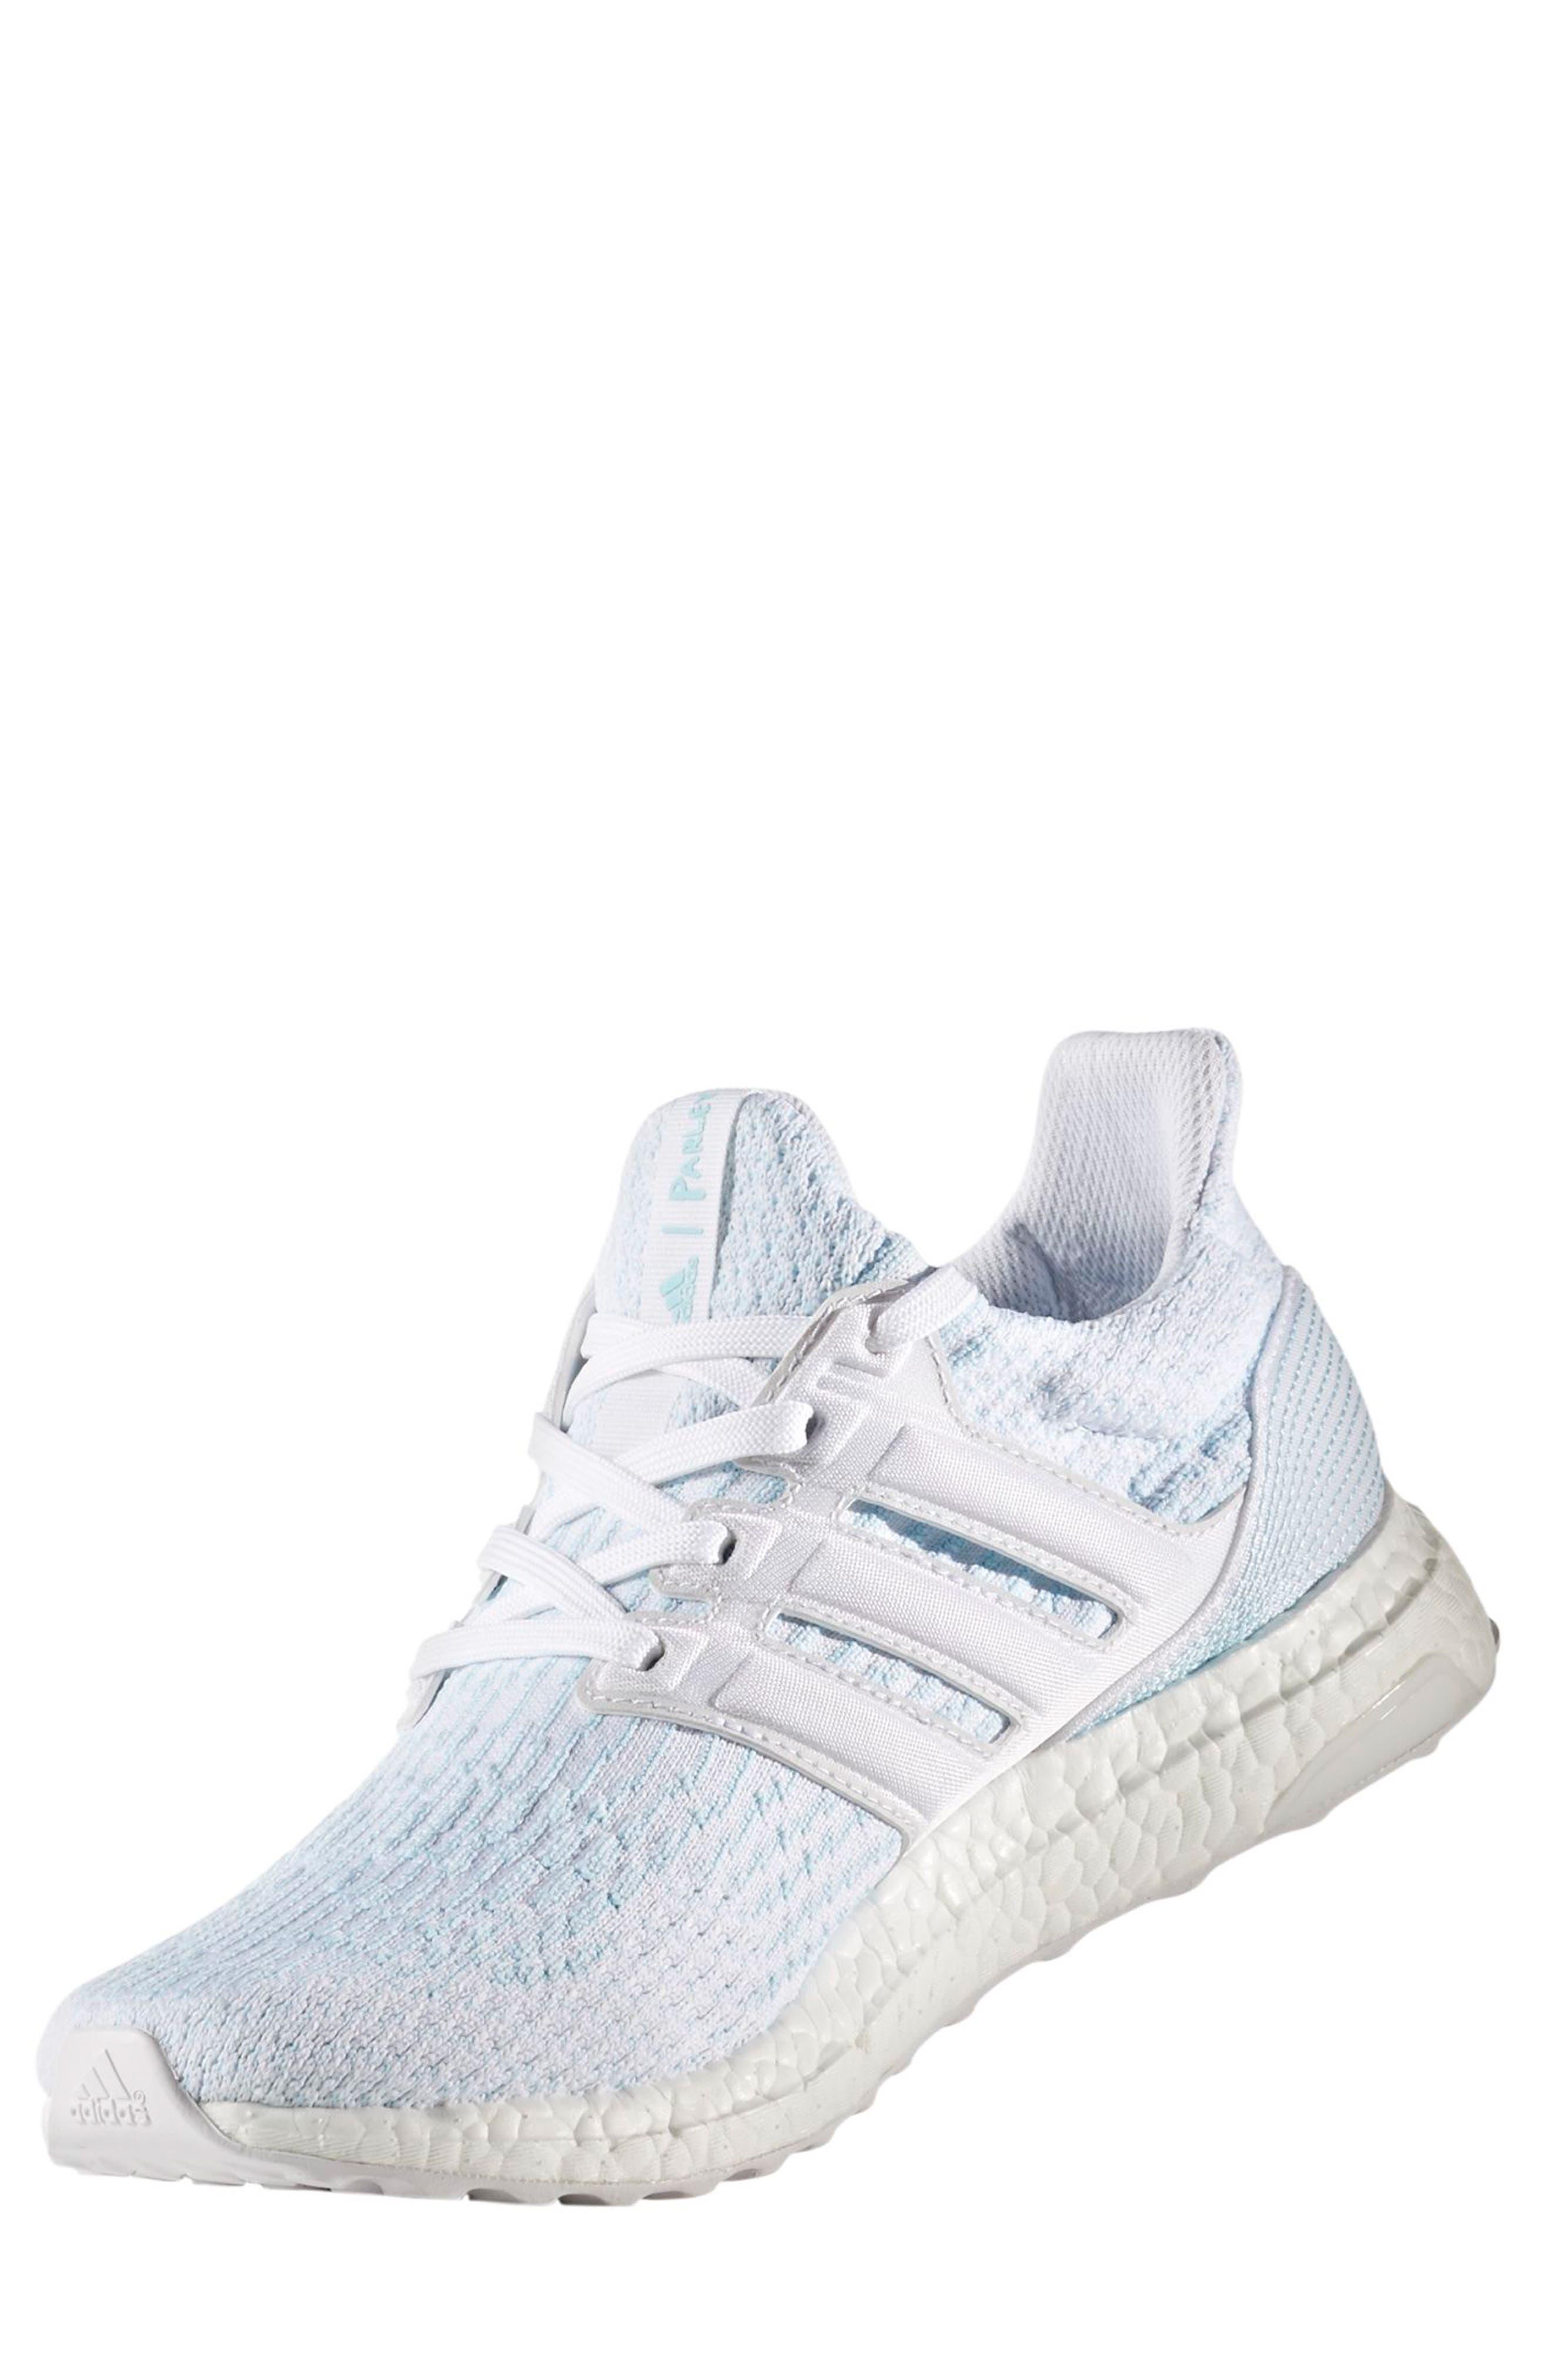 adidas Parley UltraBOOST Sneaker (Men)